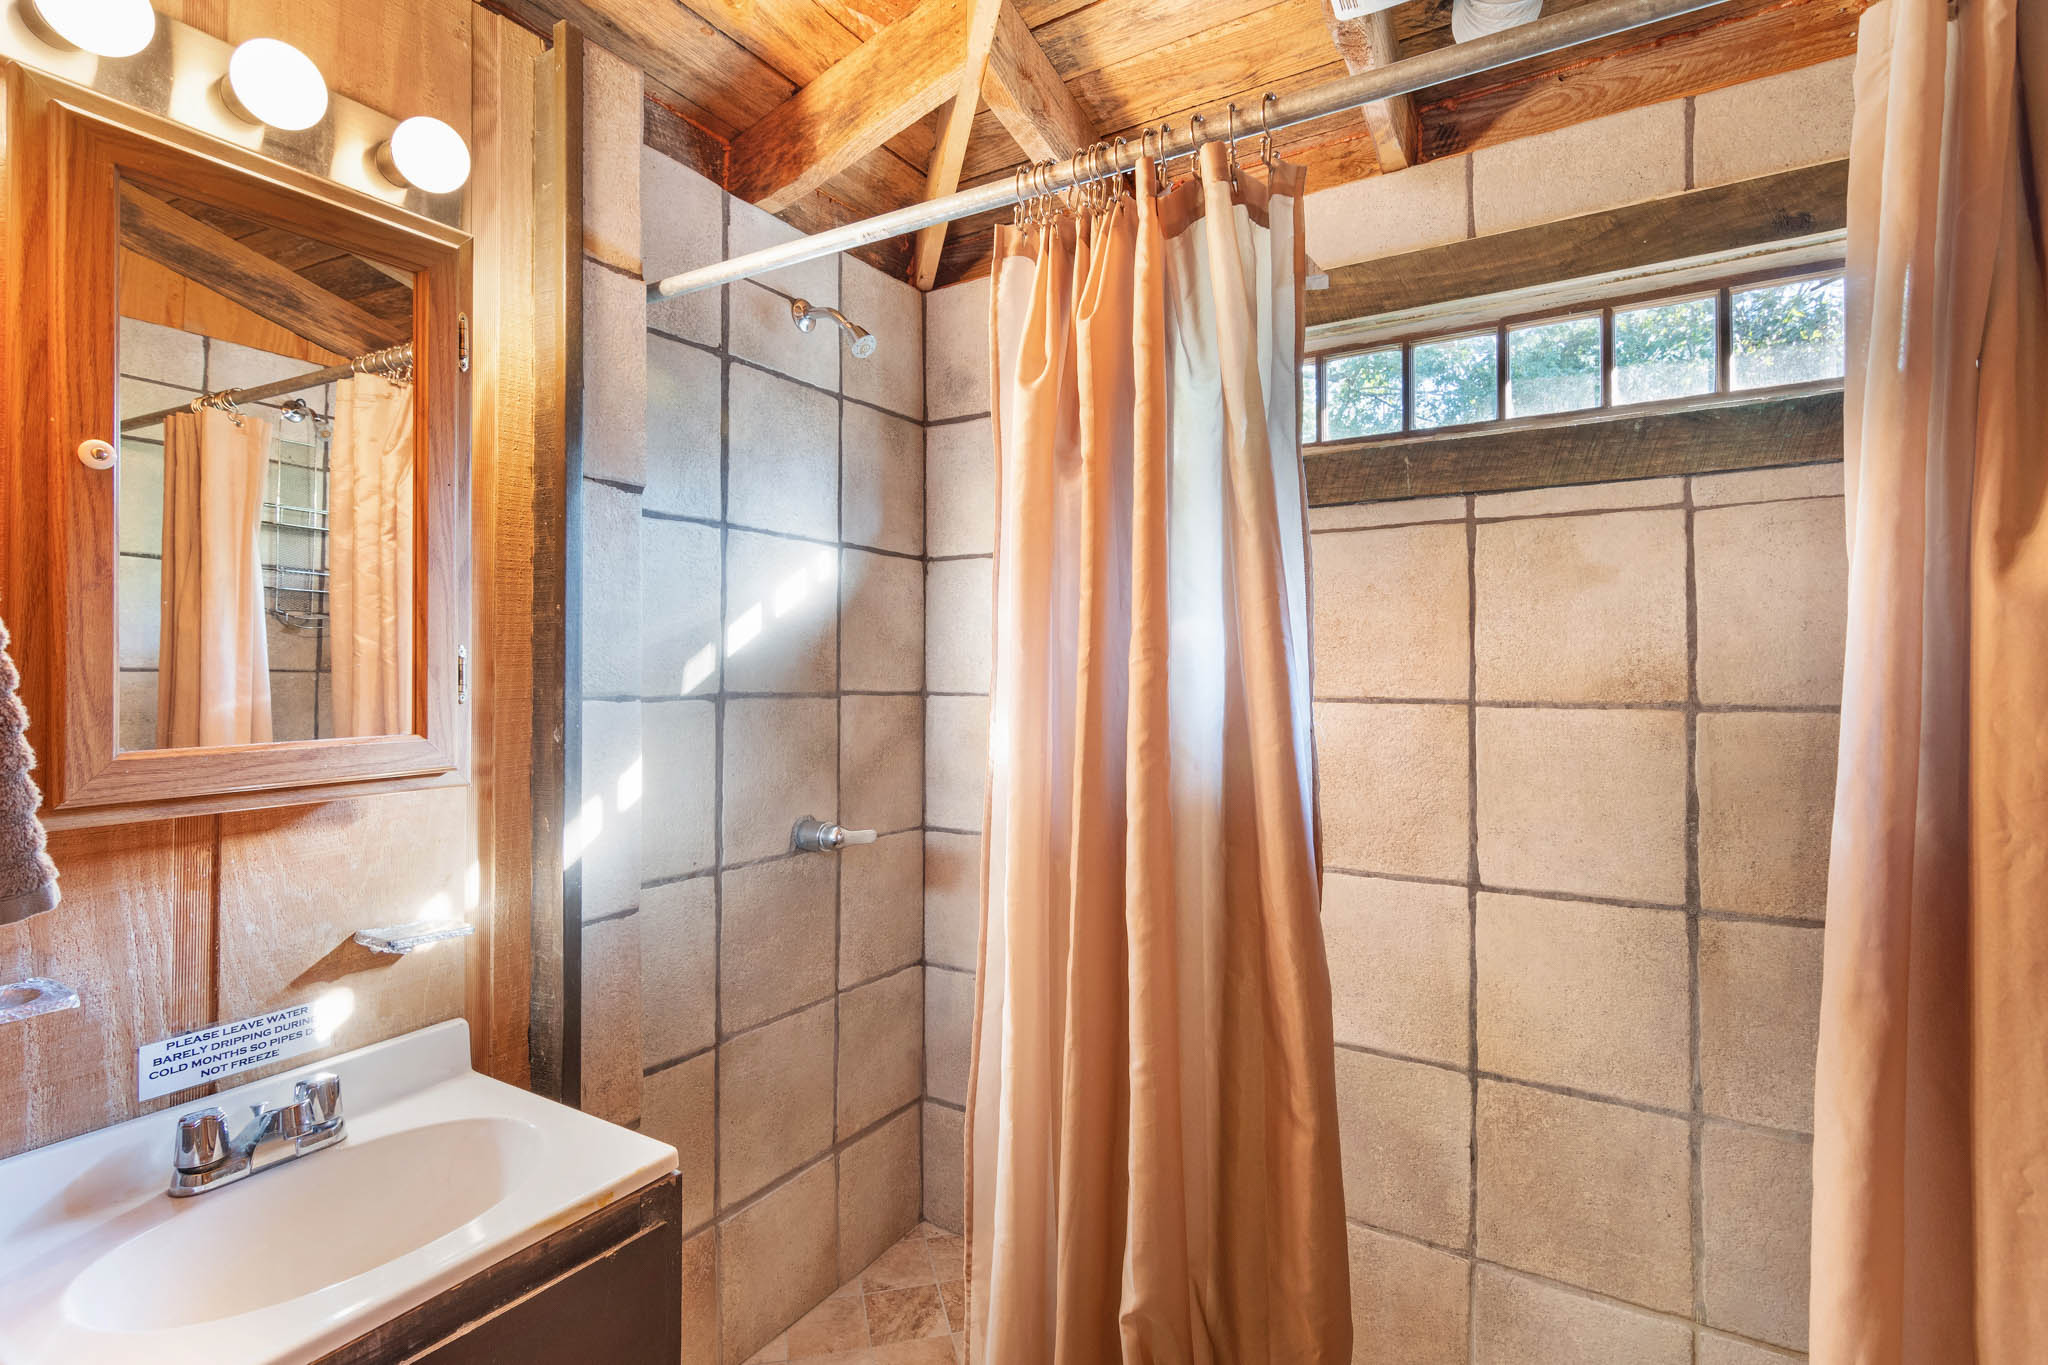 real_estate_photographer_bathroom_photography-6.jpg